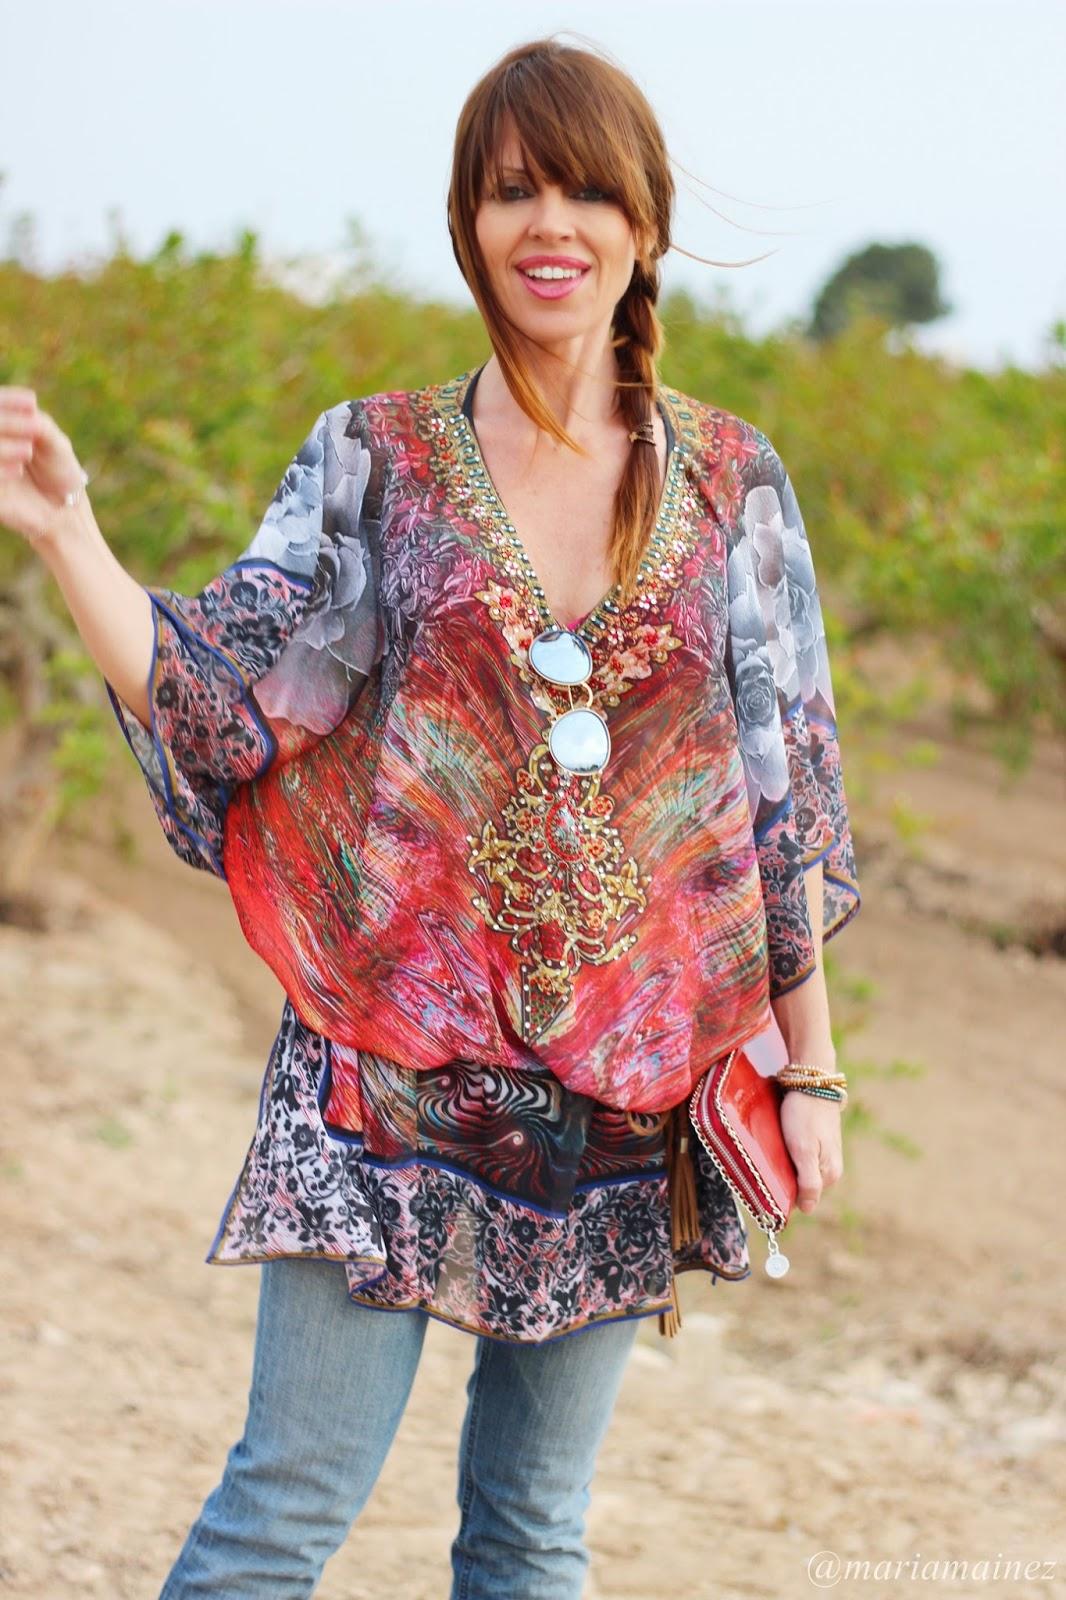 Look Boho 2015 - Hippyssidy - Spring Summer 2015 - Pantalón campana - Caftán hippie